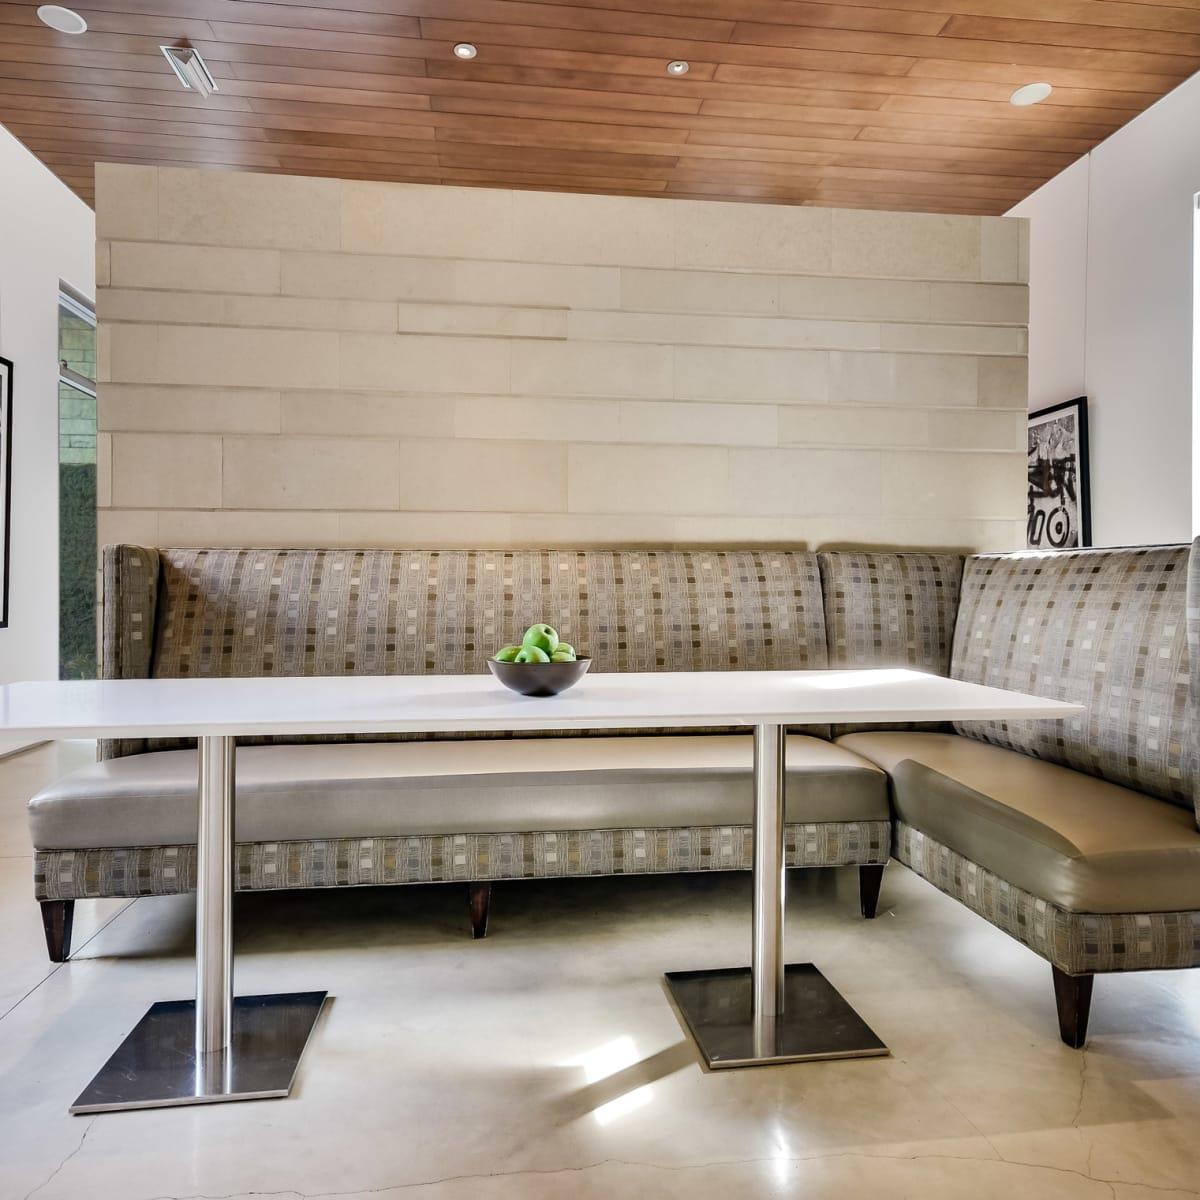 2009 Cueva de Oro Austin house for sale kitchen